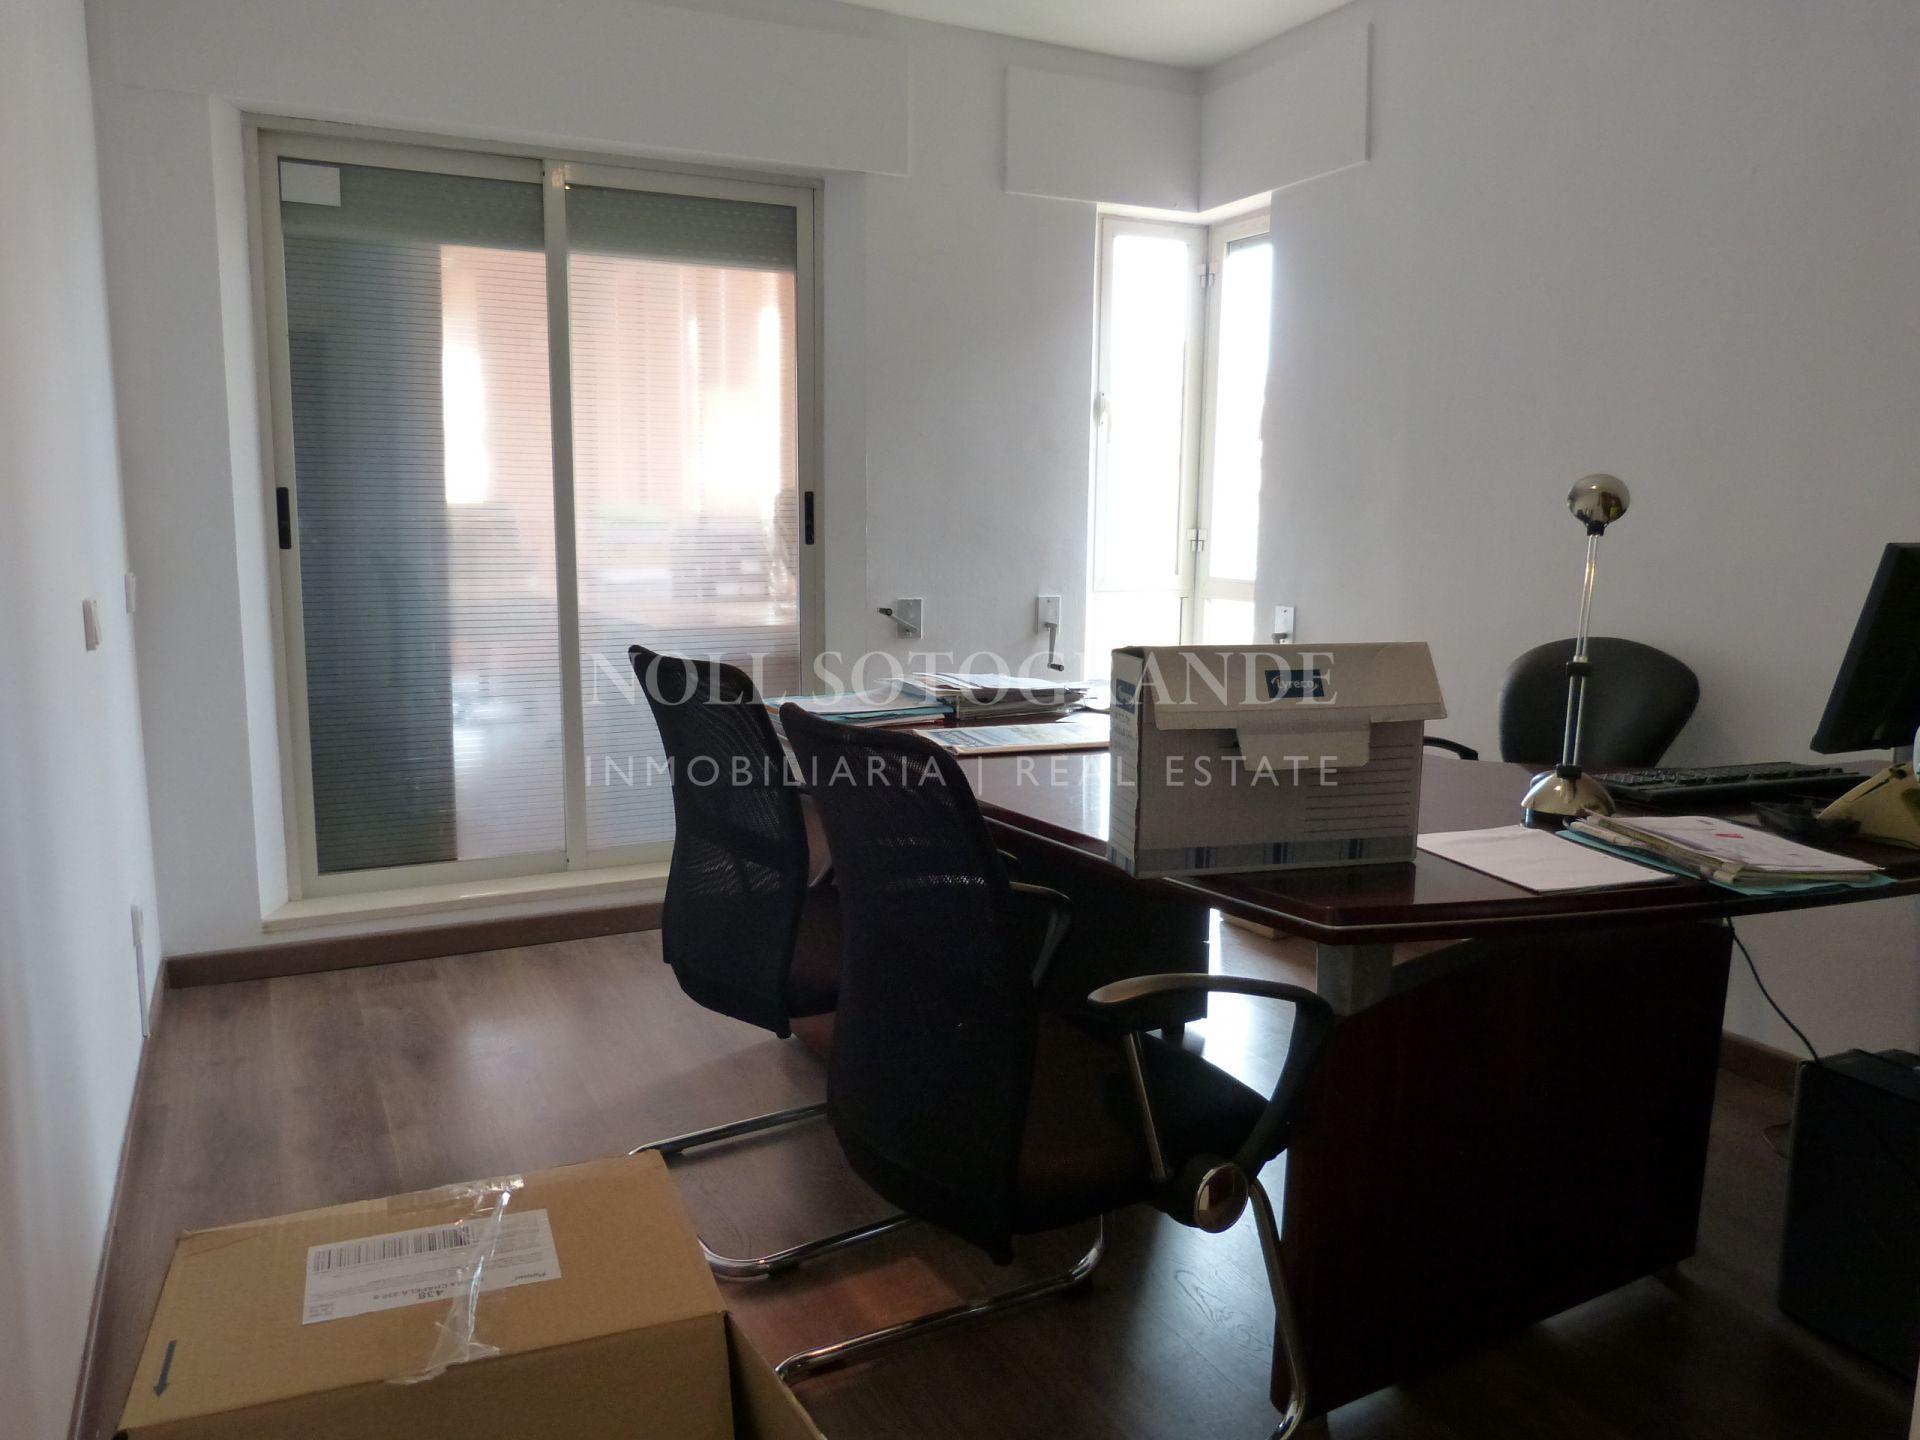 Apartment for sale in Sotogrande Puerto Deportivo, Sotogrande